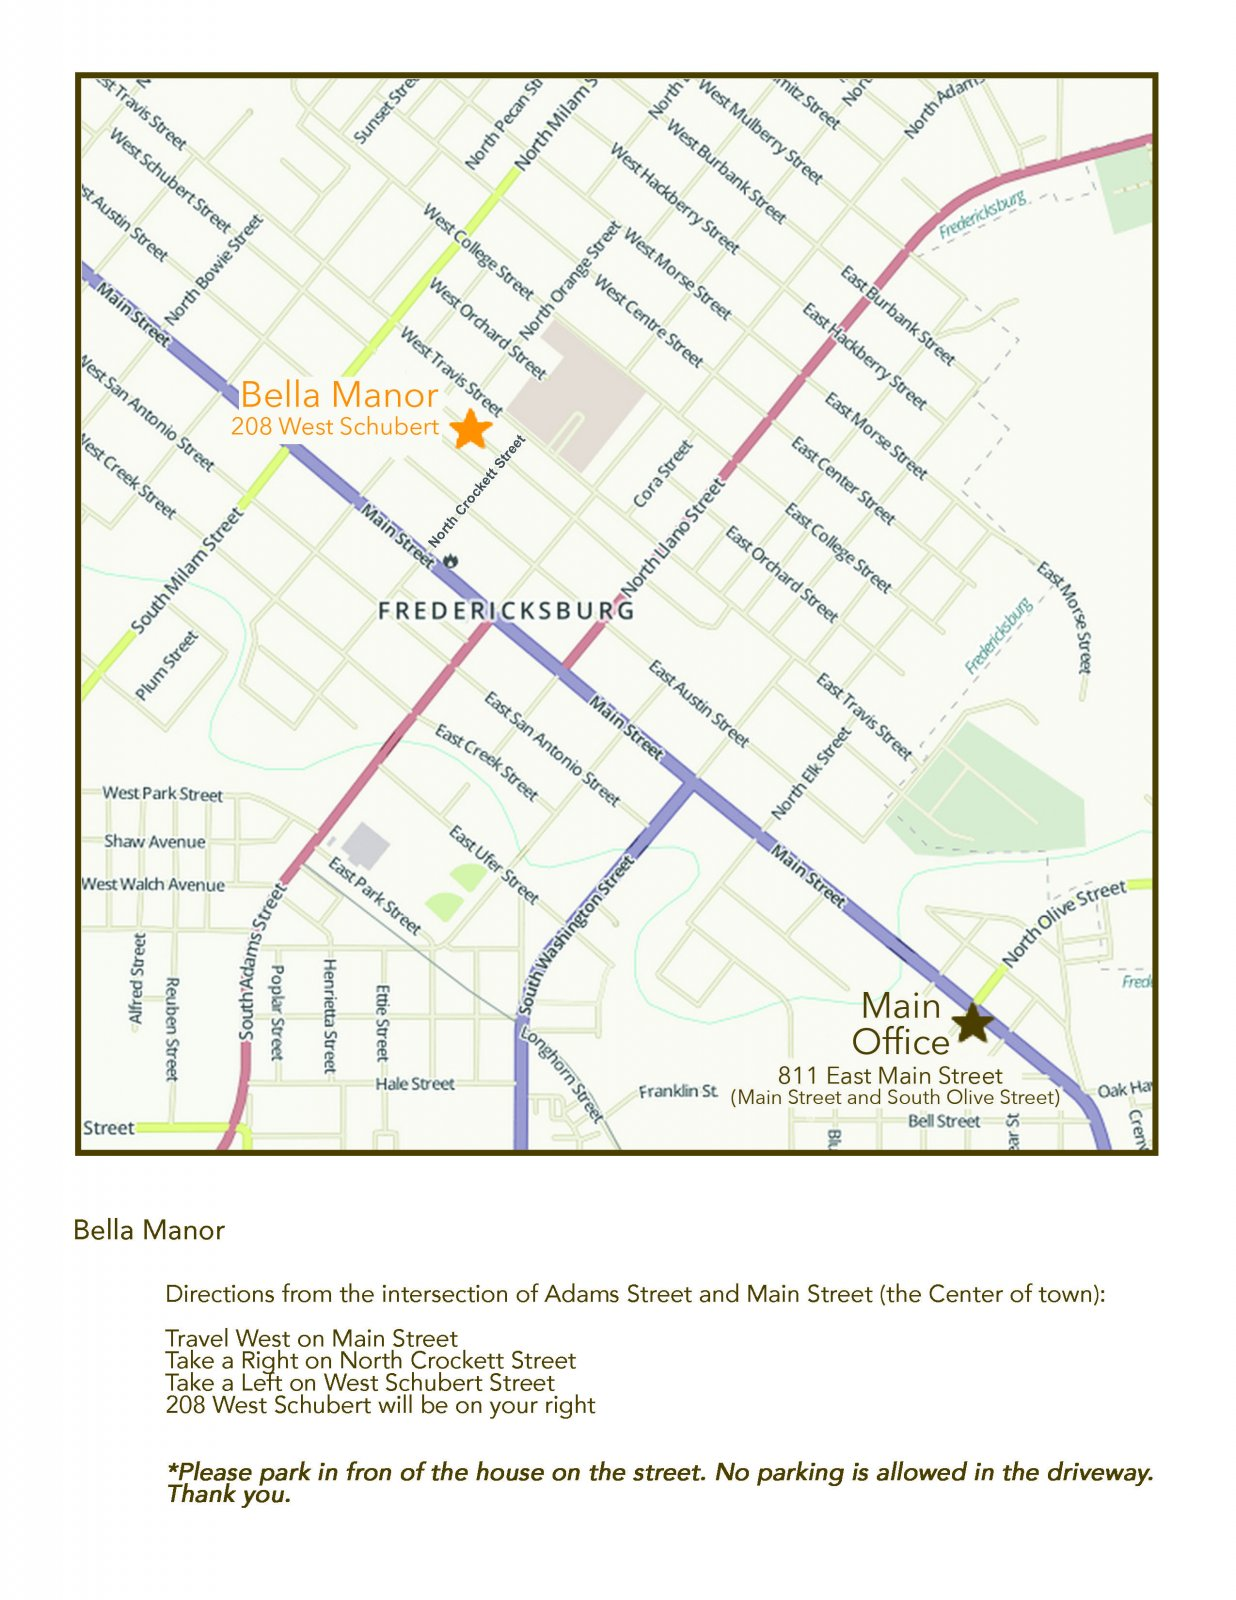 Bella Manor Map | The Maplestone, Luxury Lodging of Fredericksburg, Texas